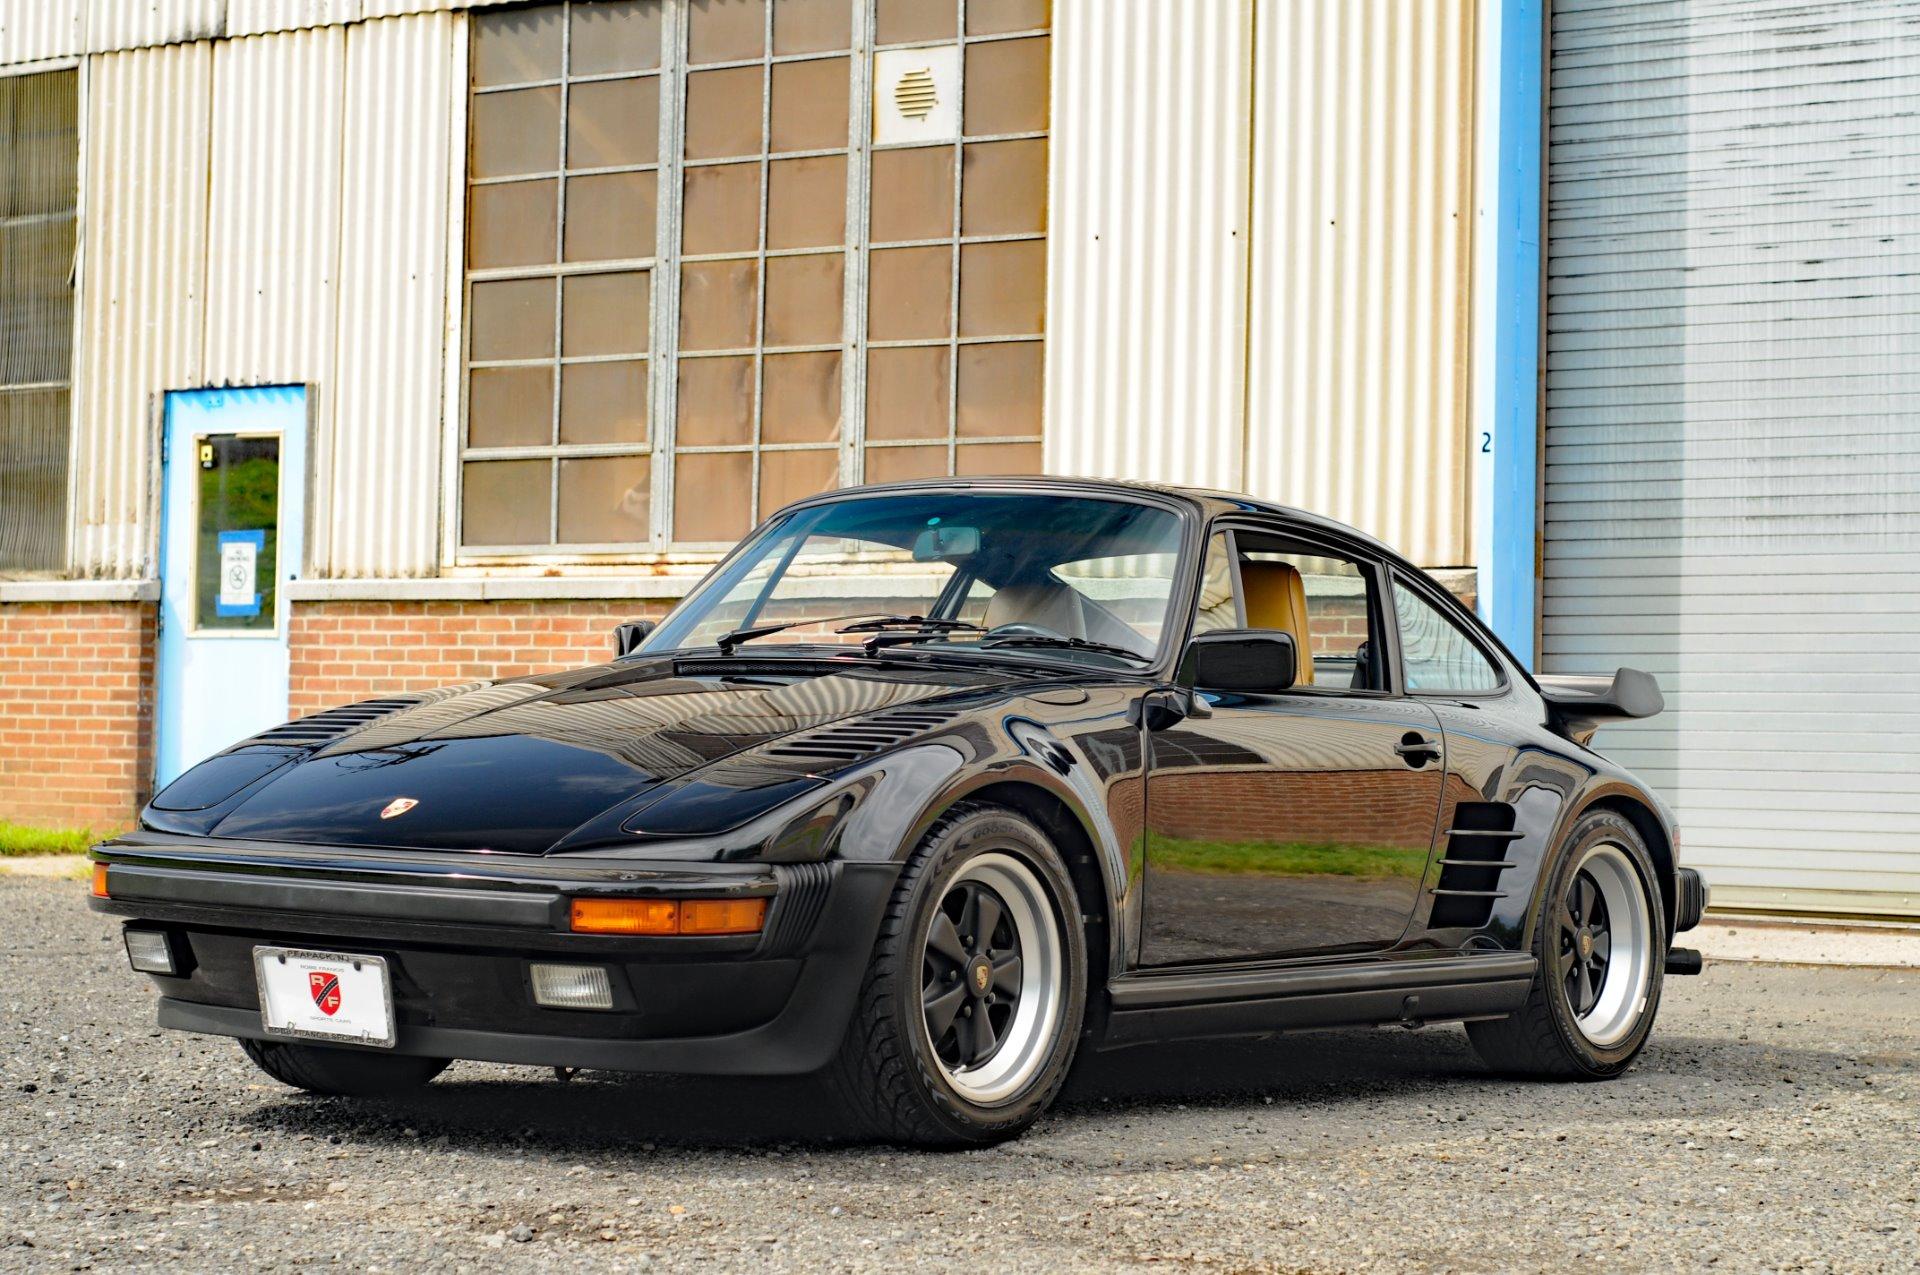 Used 1987 Porsche 911 Carrera Turbo Factory Slantnose | Peapack, NJ